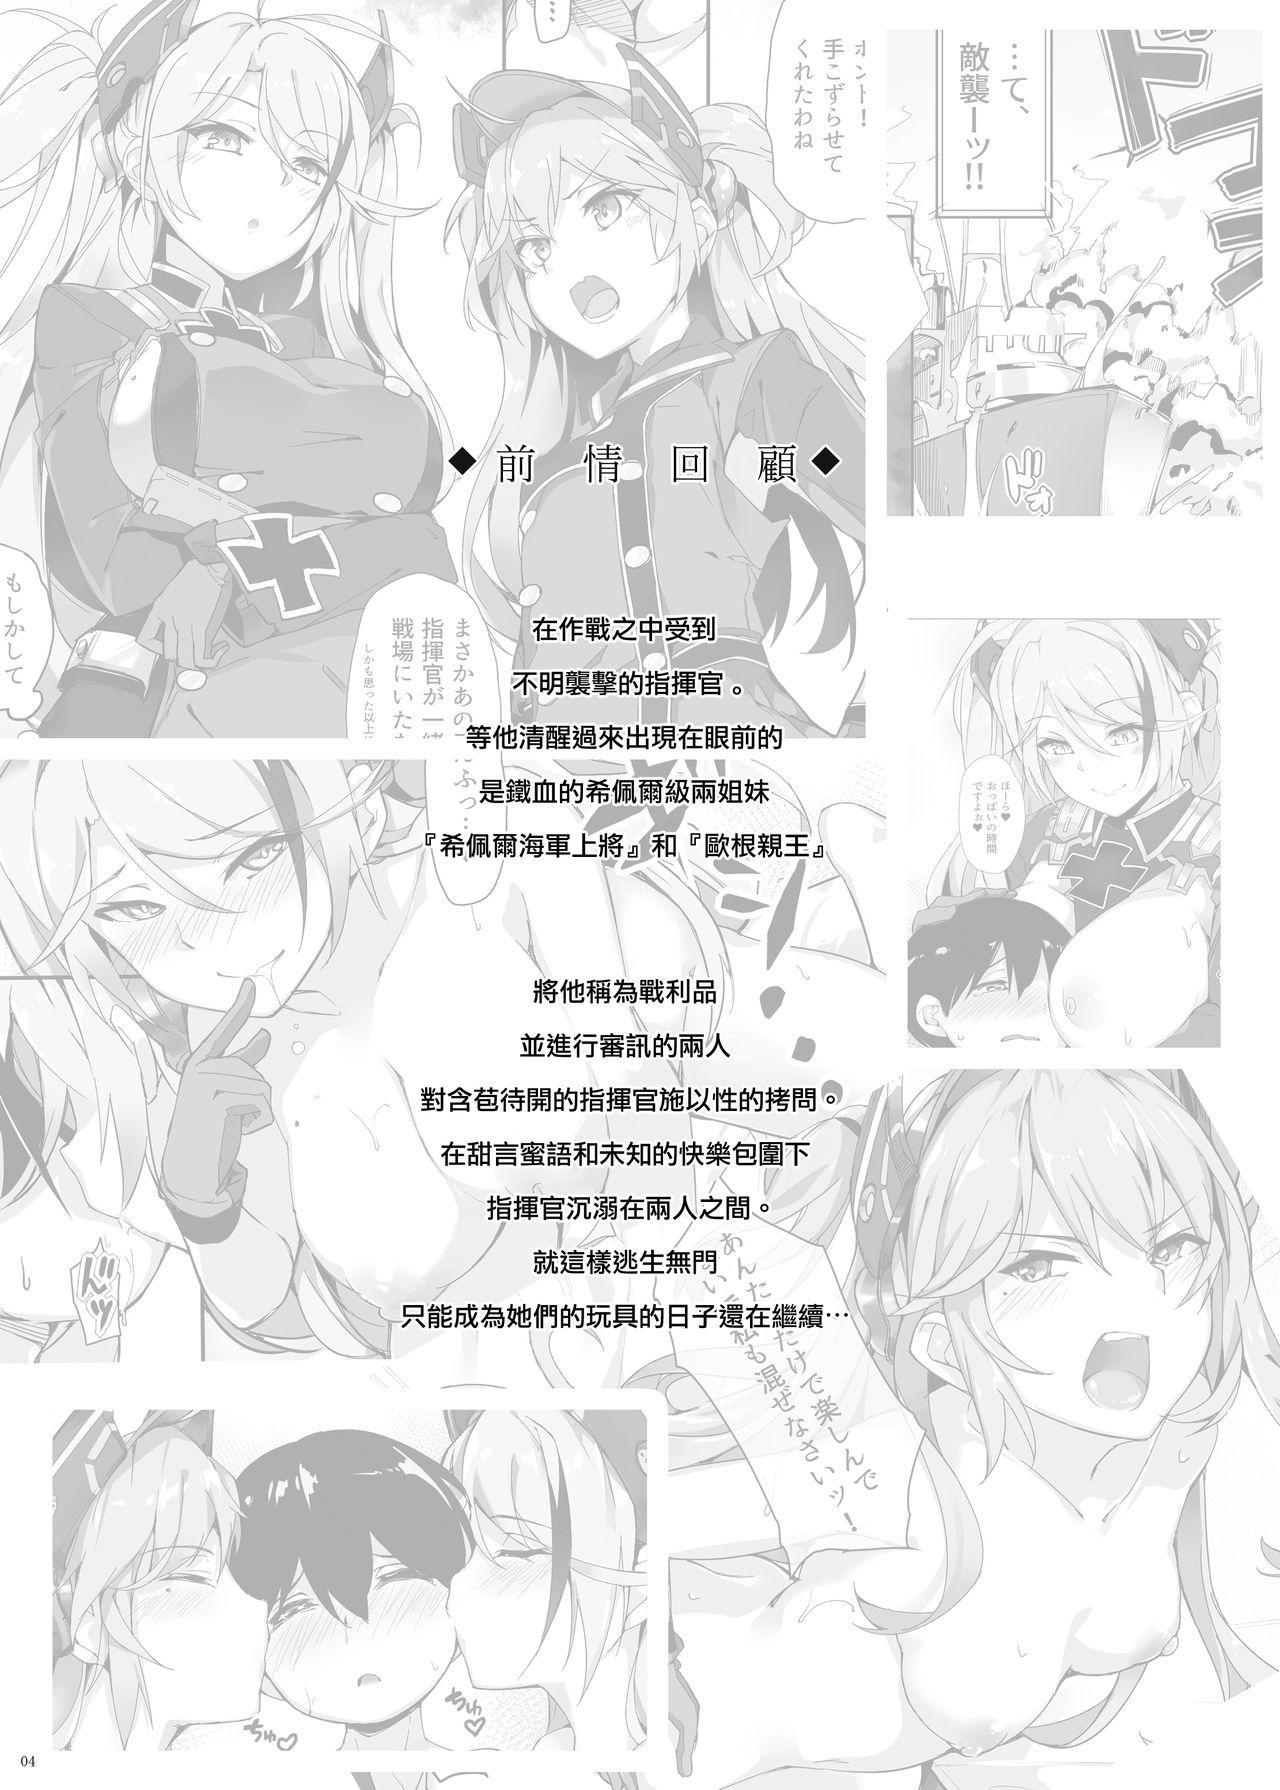 Zeppelin no Shota Aiyoku Hogo 4